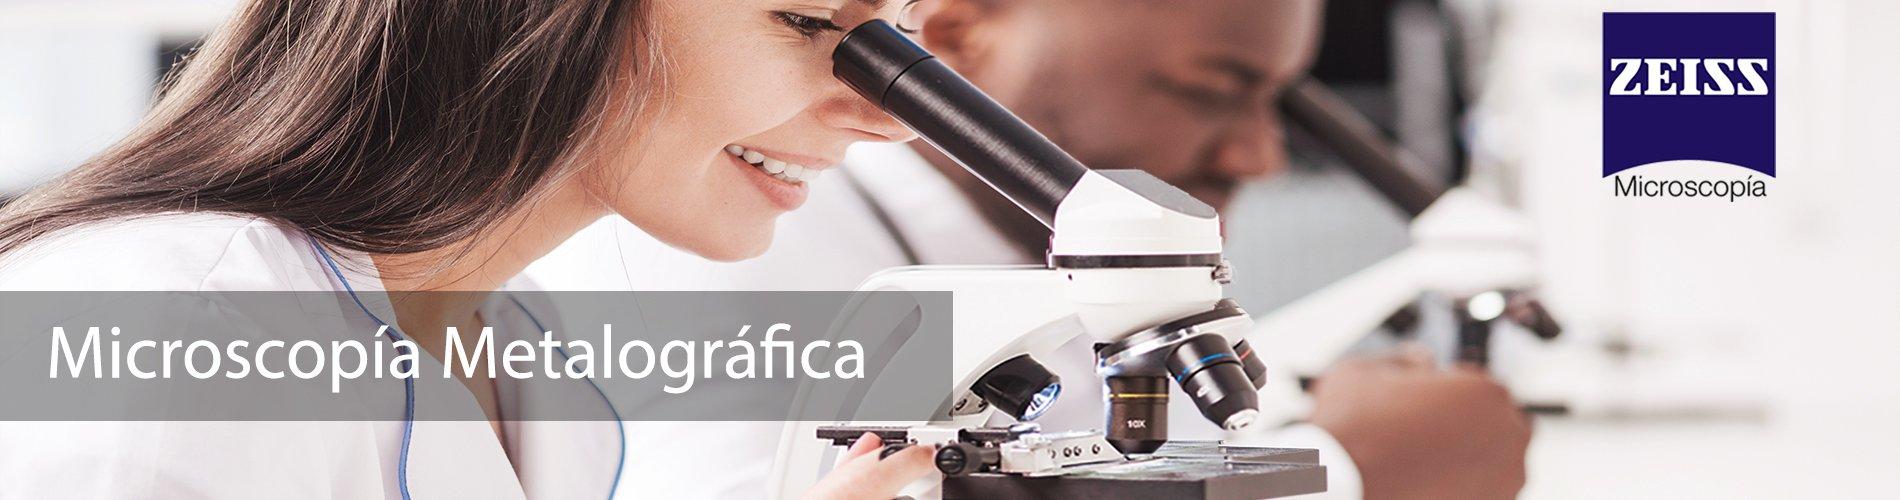 Microscopia Zeiss